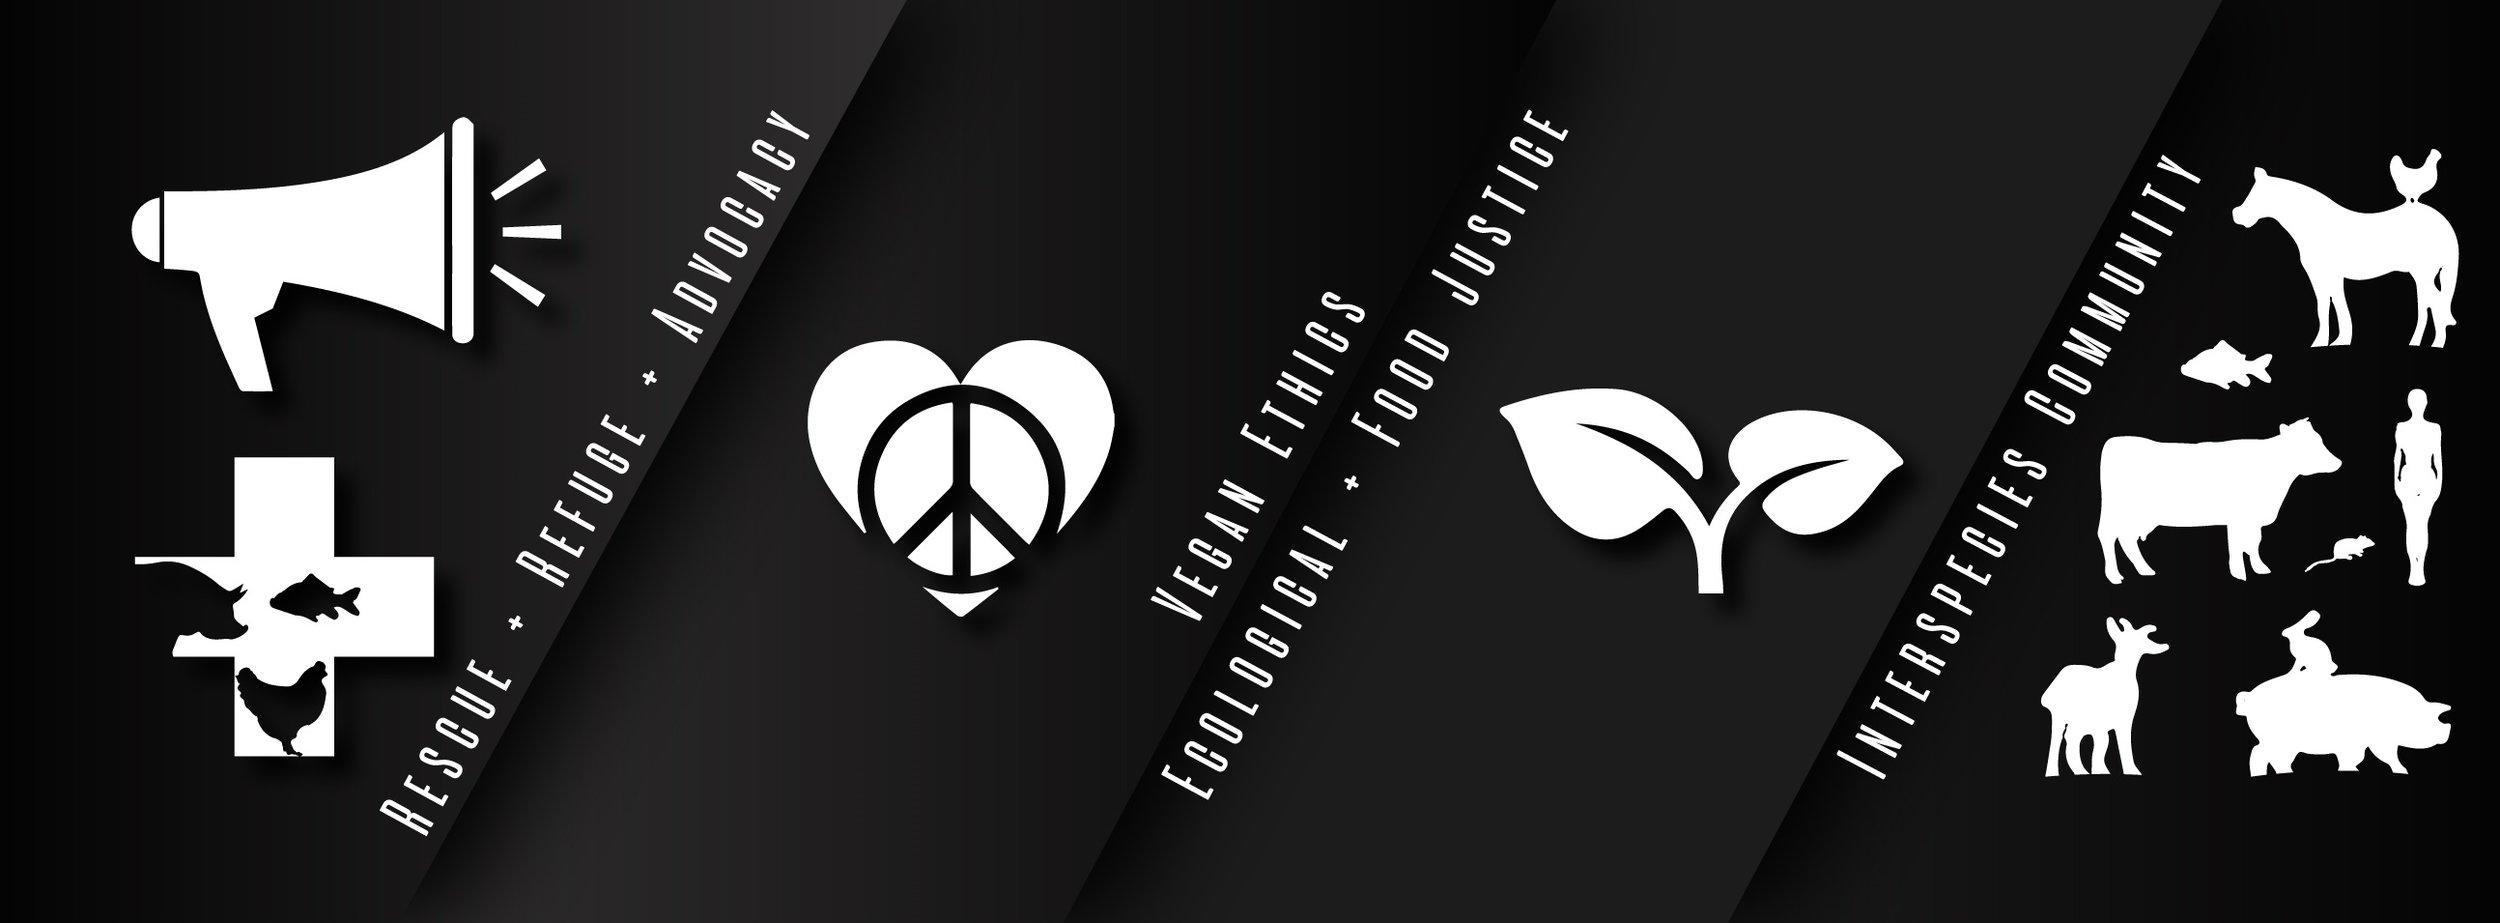 Riverdale-Farm-Facebook-Banner-FINAL.jpg